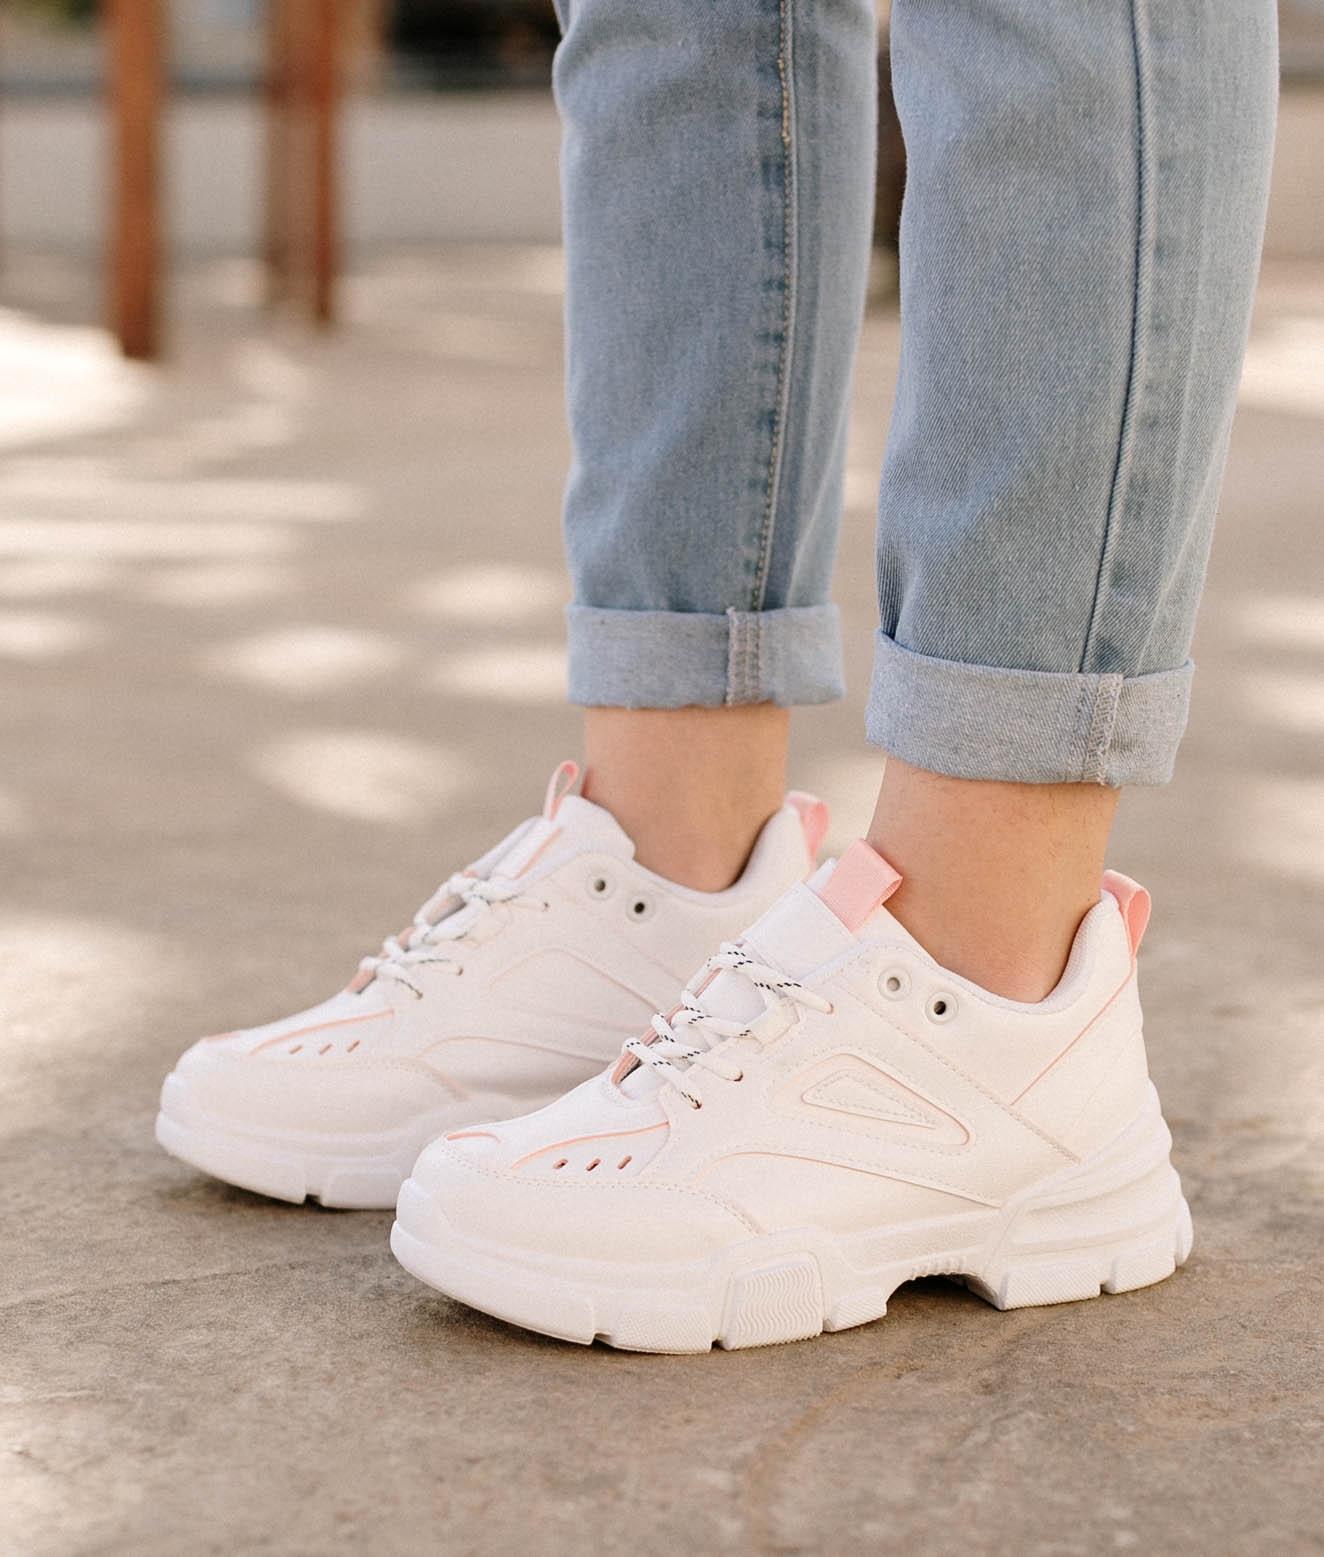 Sneakers Turini - White/Pink